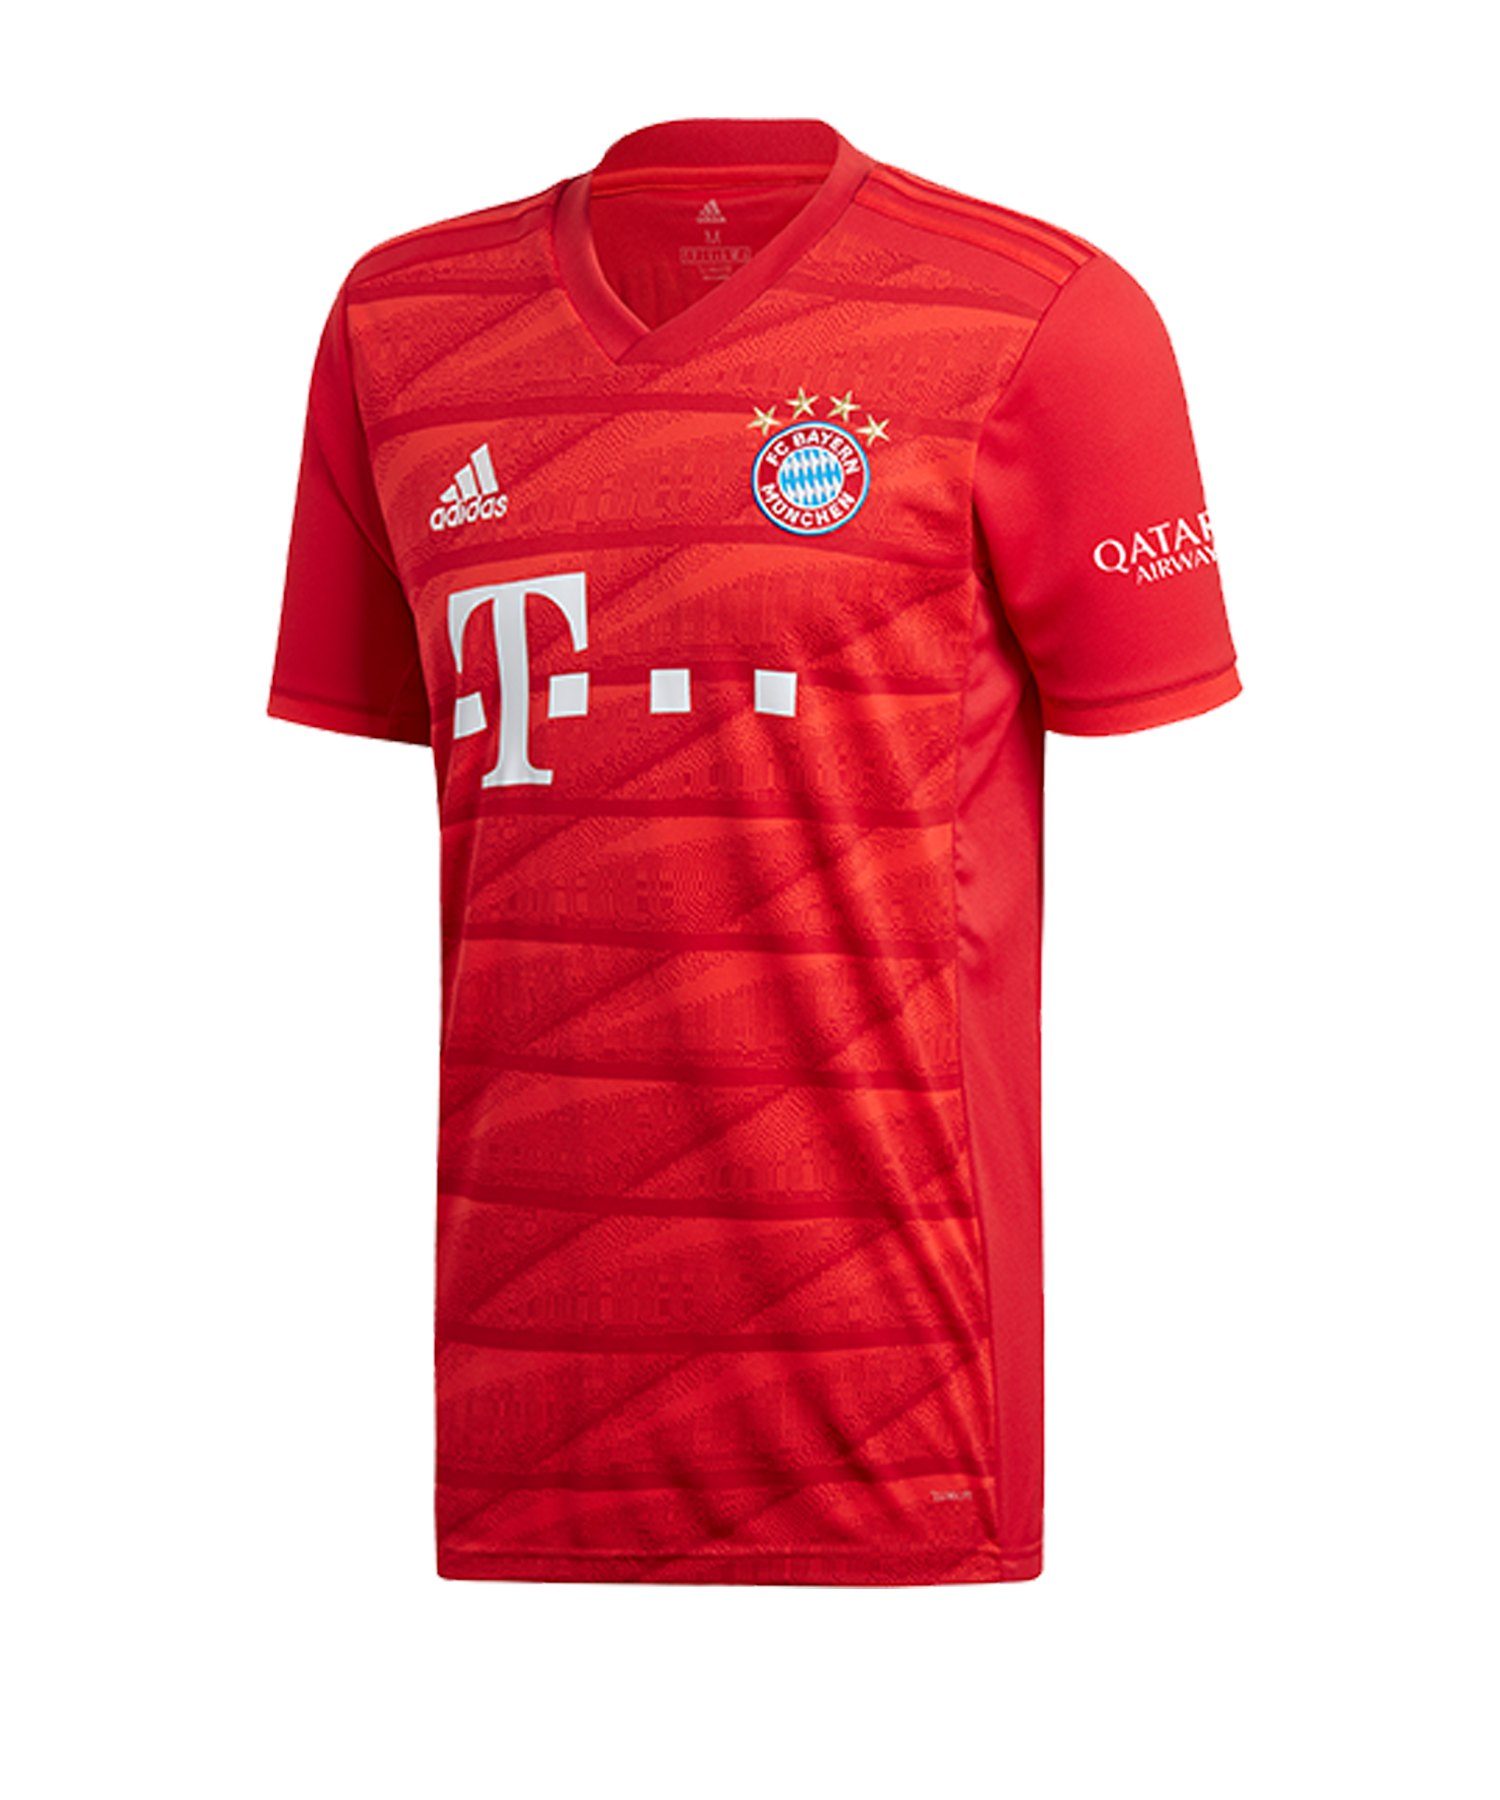 adidas FC Bayern München Trikot Home 2019/2020 Rot - Rot